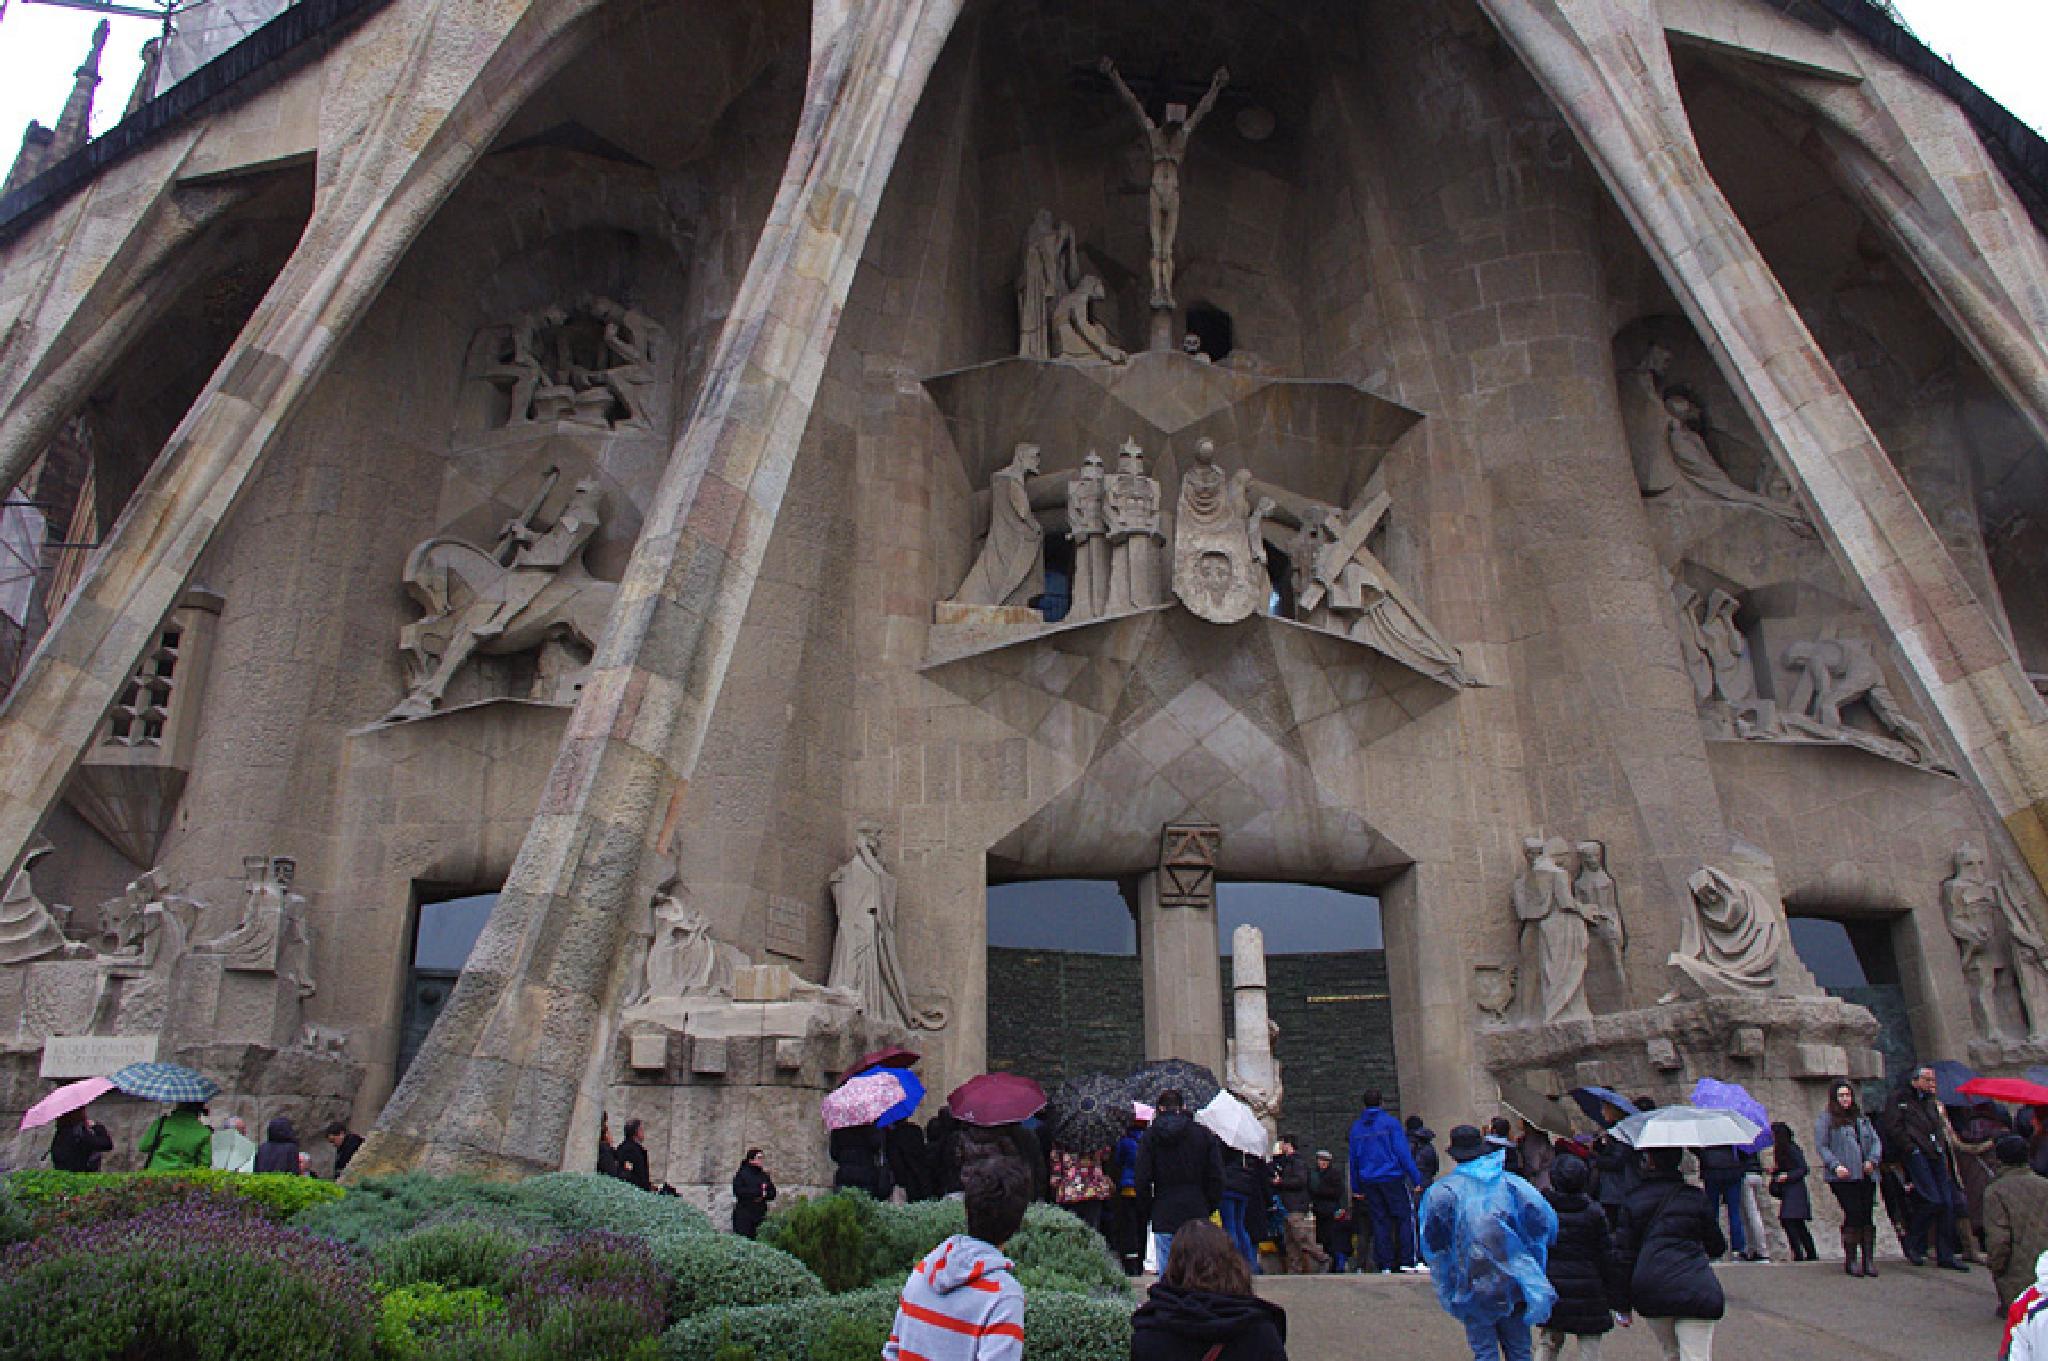 Barcalona Sagrada Familia 3b 31 December 2010 by Owen Smithers